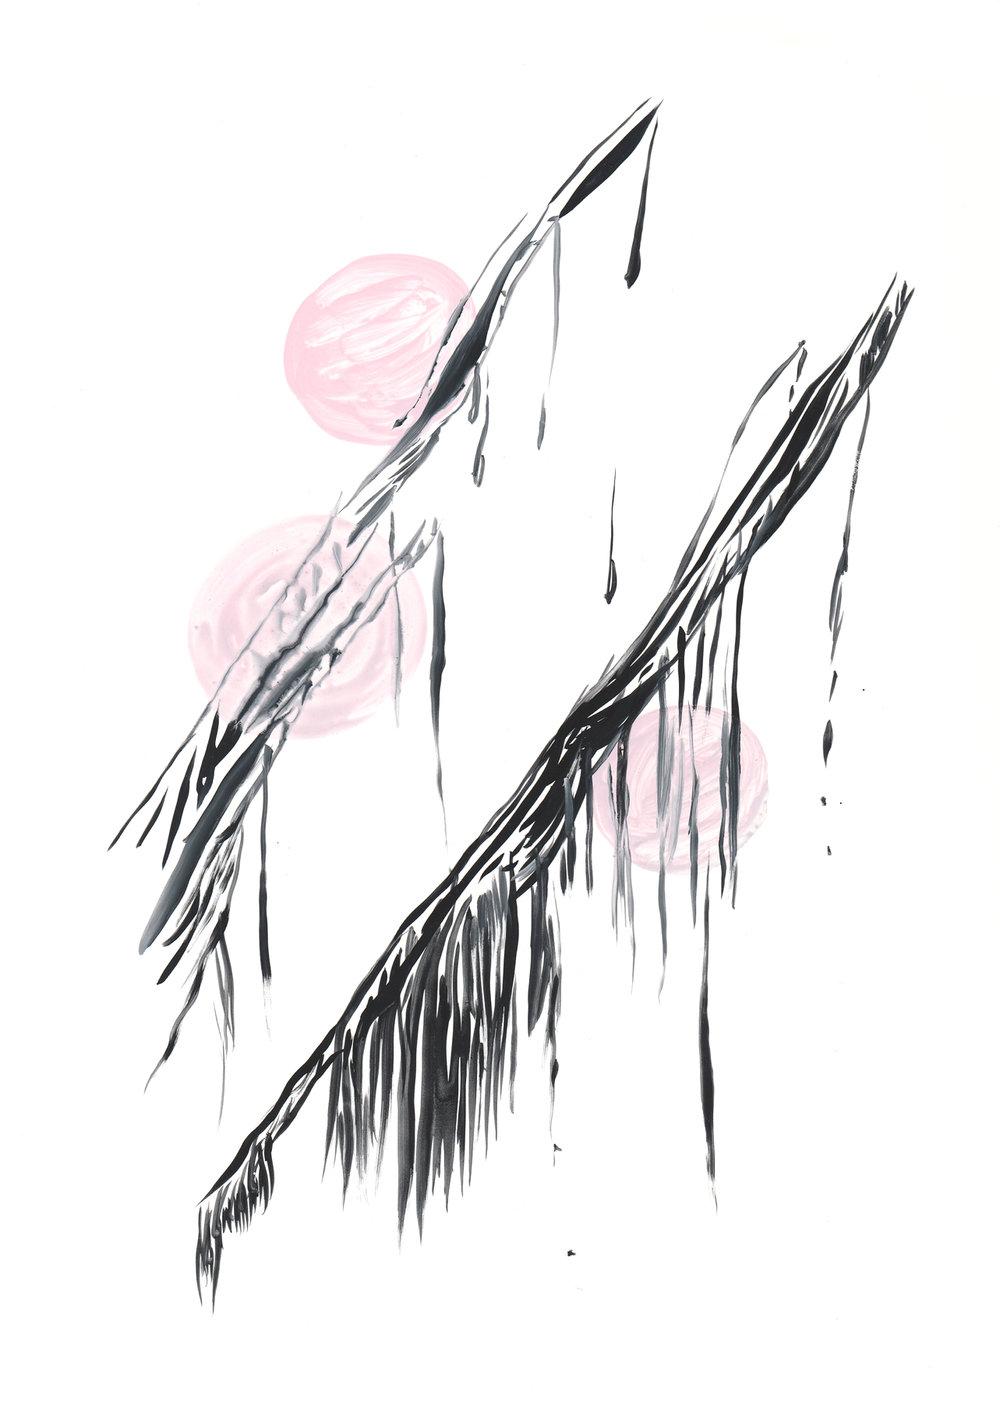 07 kw.jpg